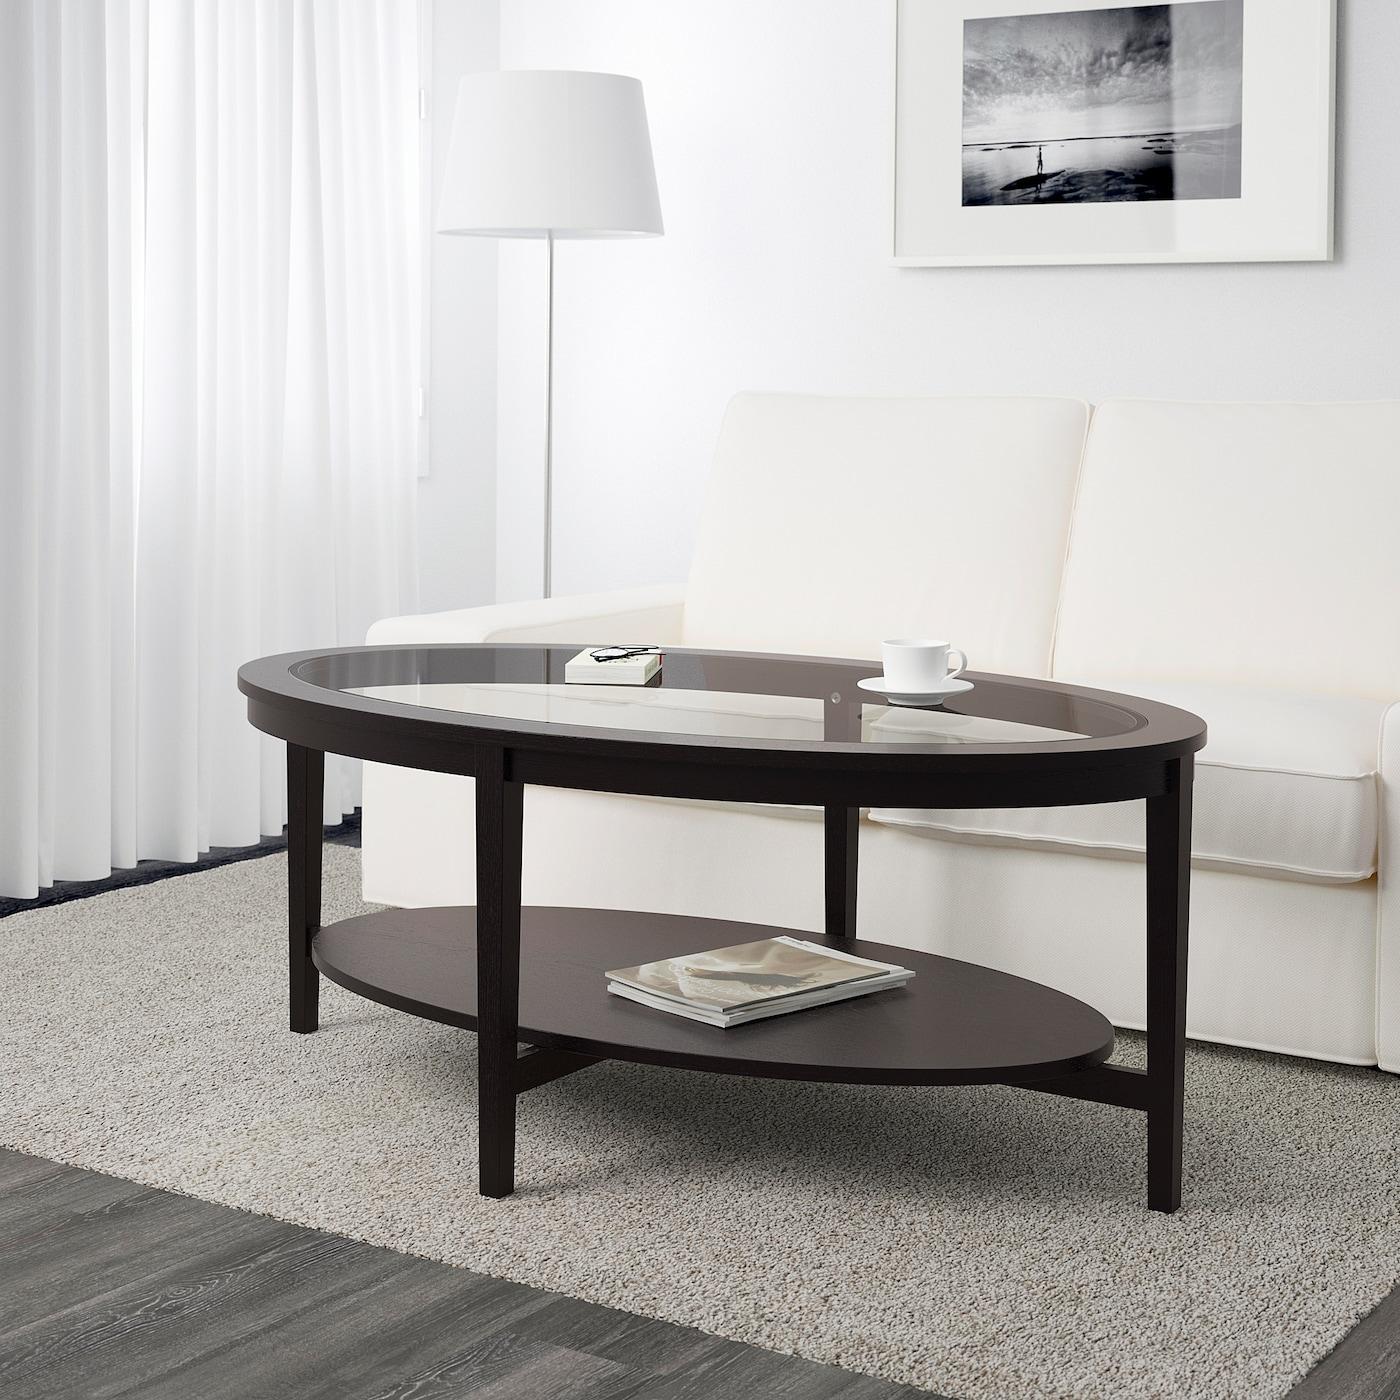 Malmsta Coffee Table Black Brown 130x80 Cm Ikea Ireland [ 1400 x 1400 Pixel ]